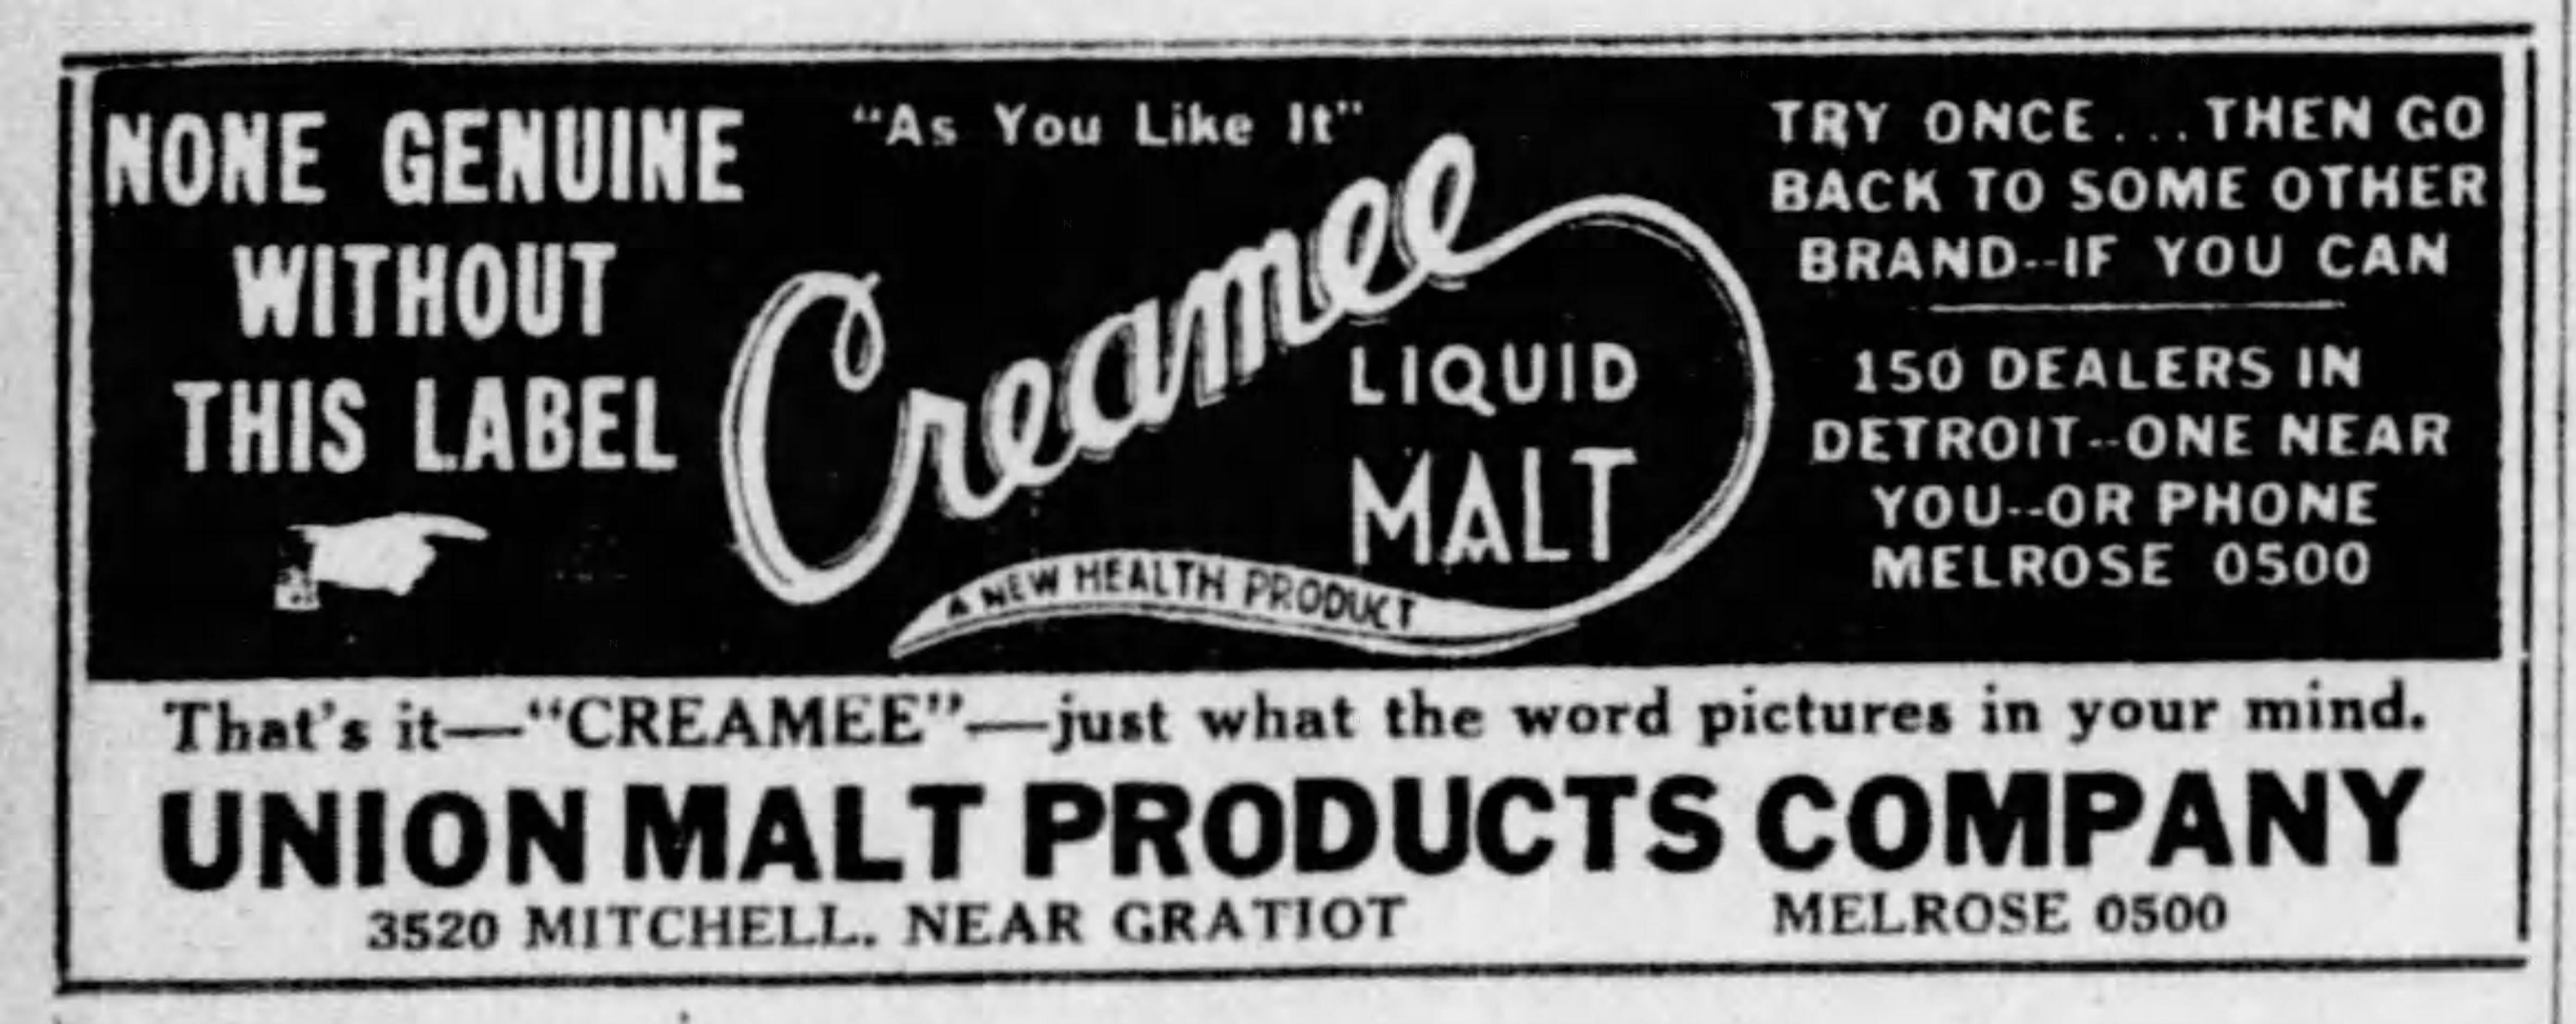 Union Malt Products Company_Detroit_Free_Press_Michigan_Mon__Apr_11__1932_.jpg